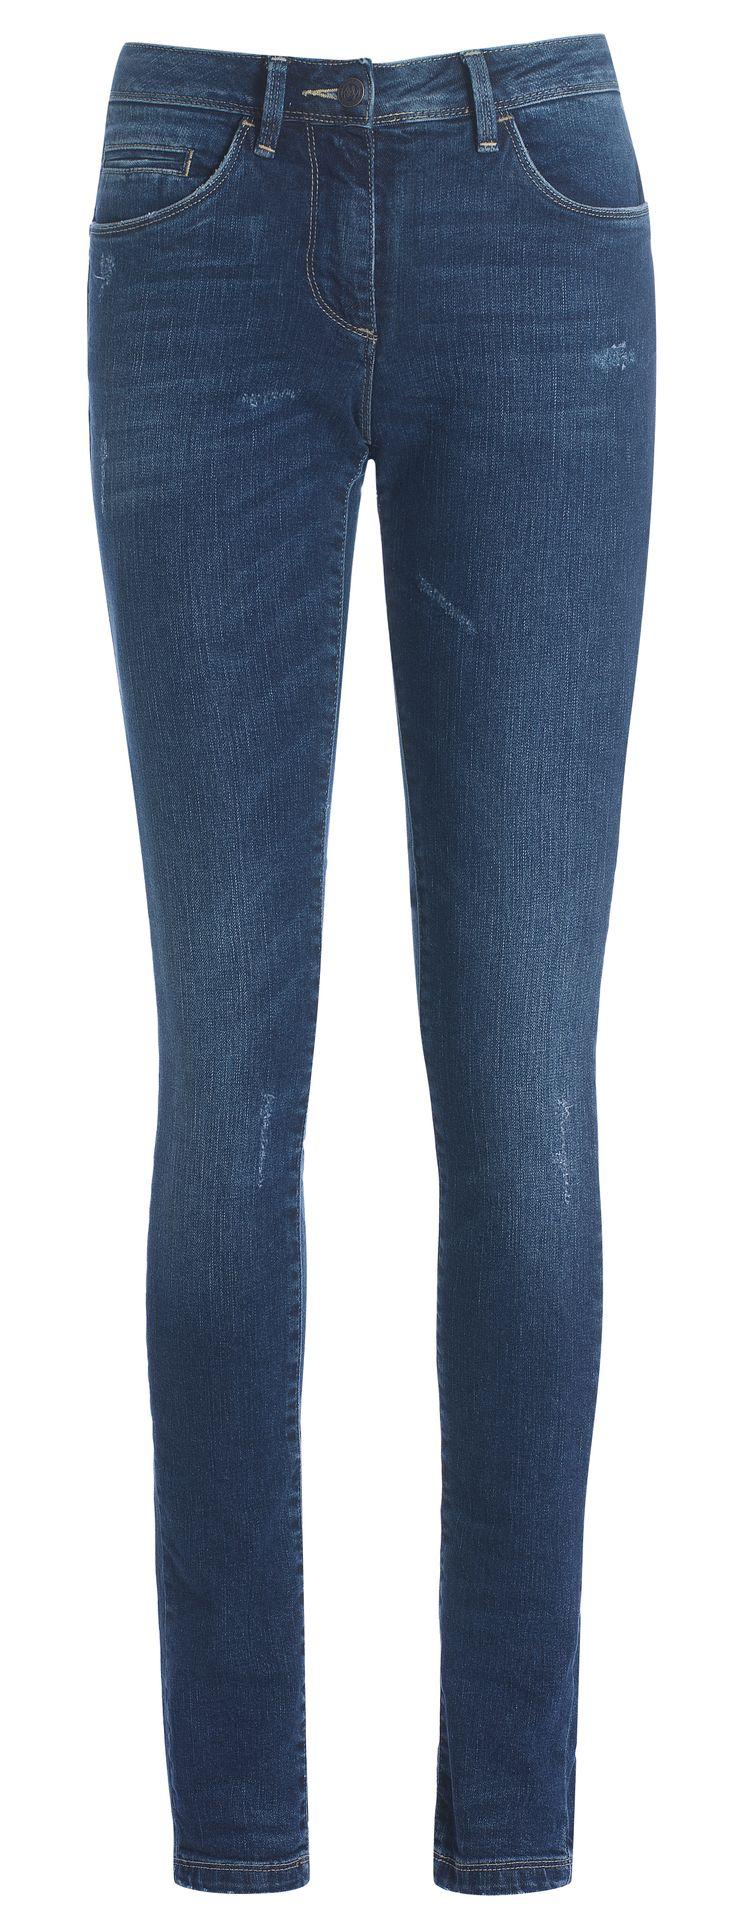 Henri Lloyd distressed jeans